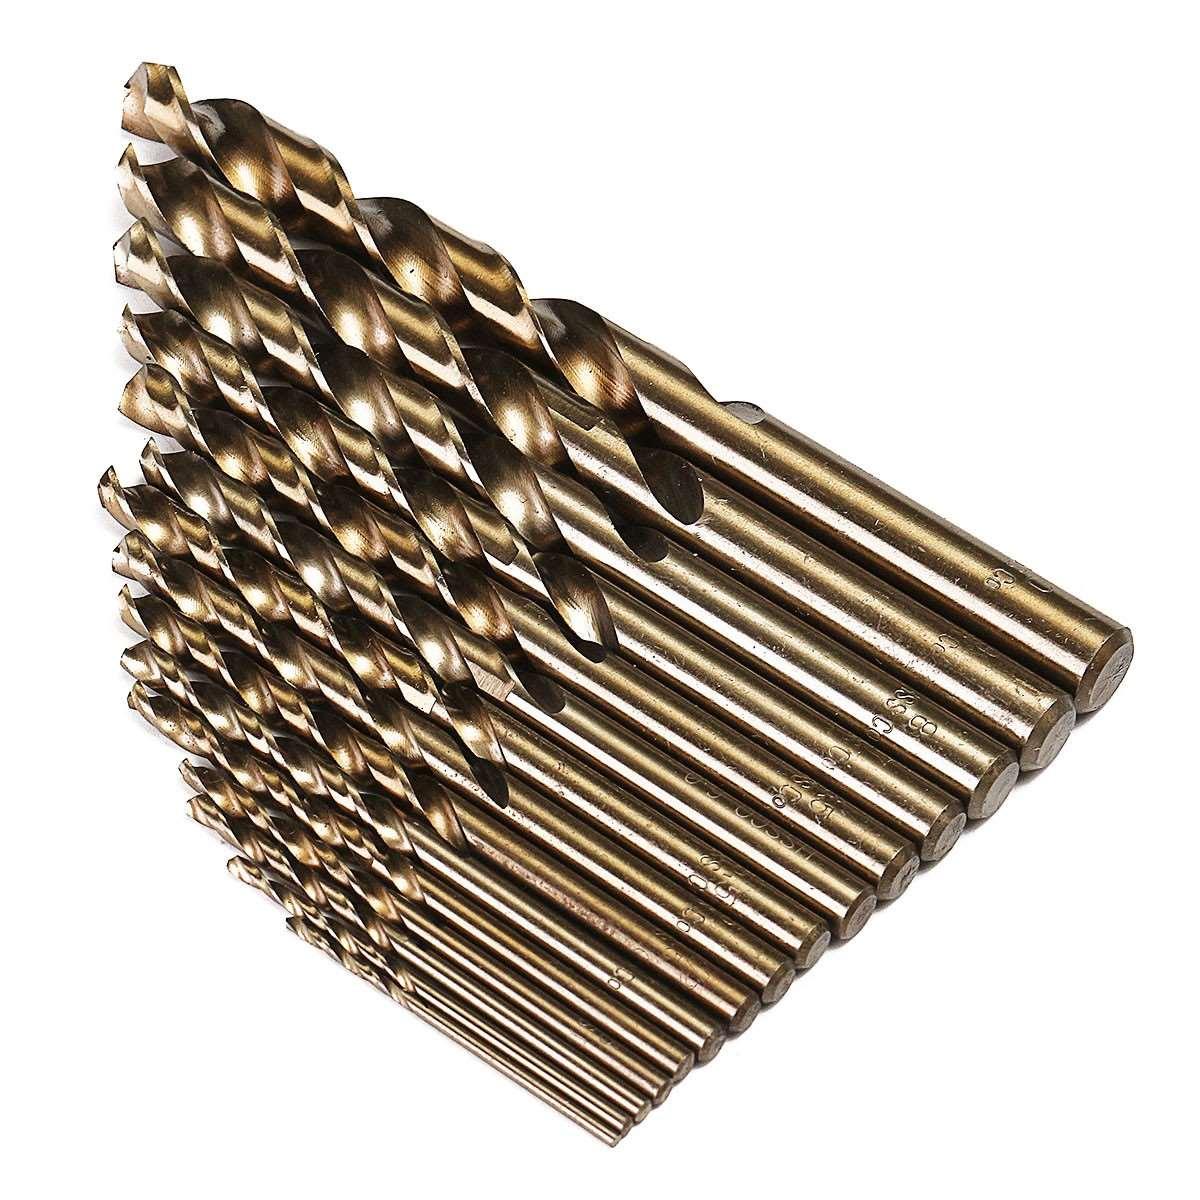 Doersupp 15 pz / set HSS-CO 1.5-10mm acciaio ad alta velocità M35 - Punta da trapano - Fotografia 2